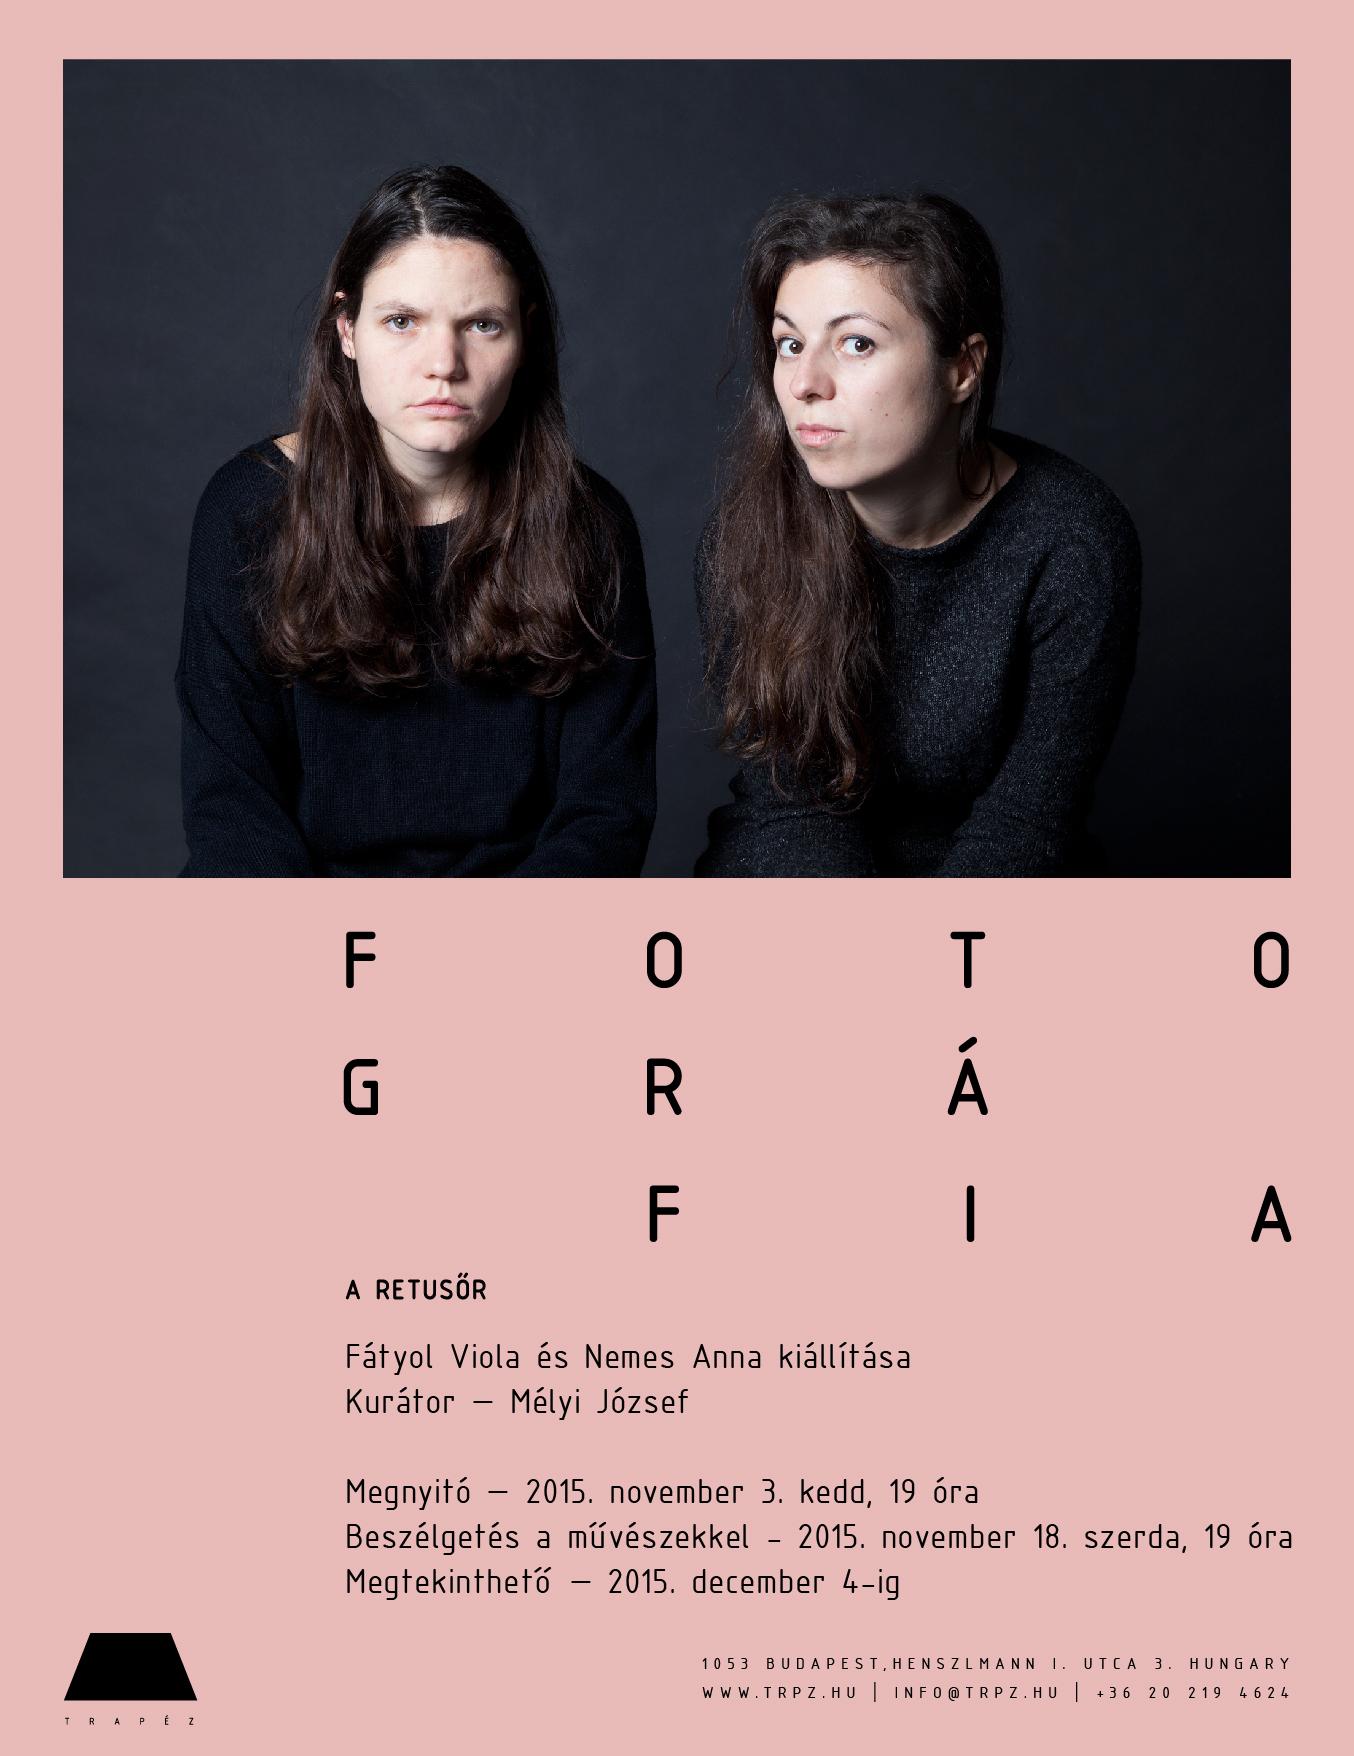 fatyolviola-03